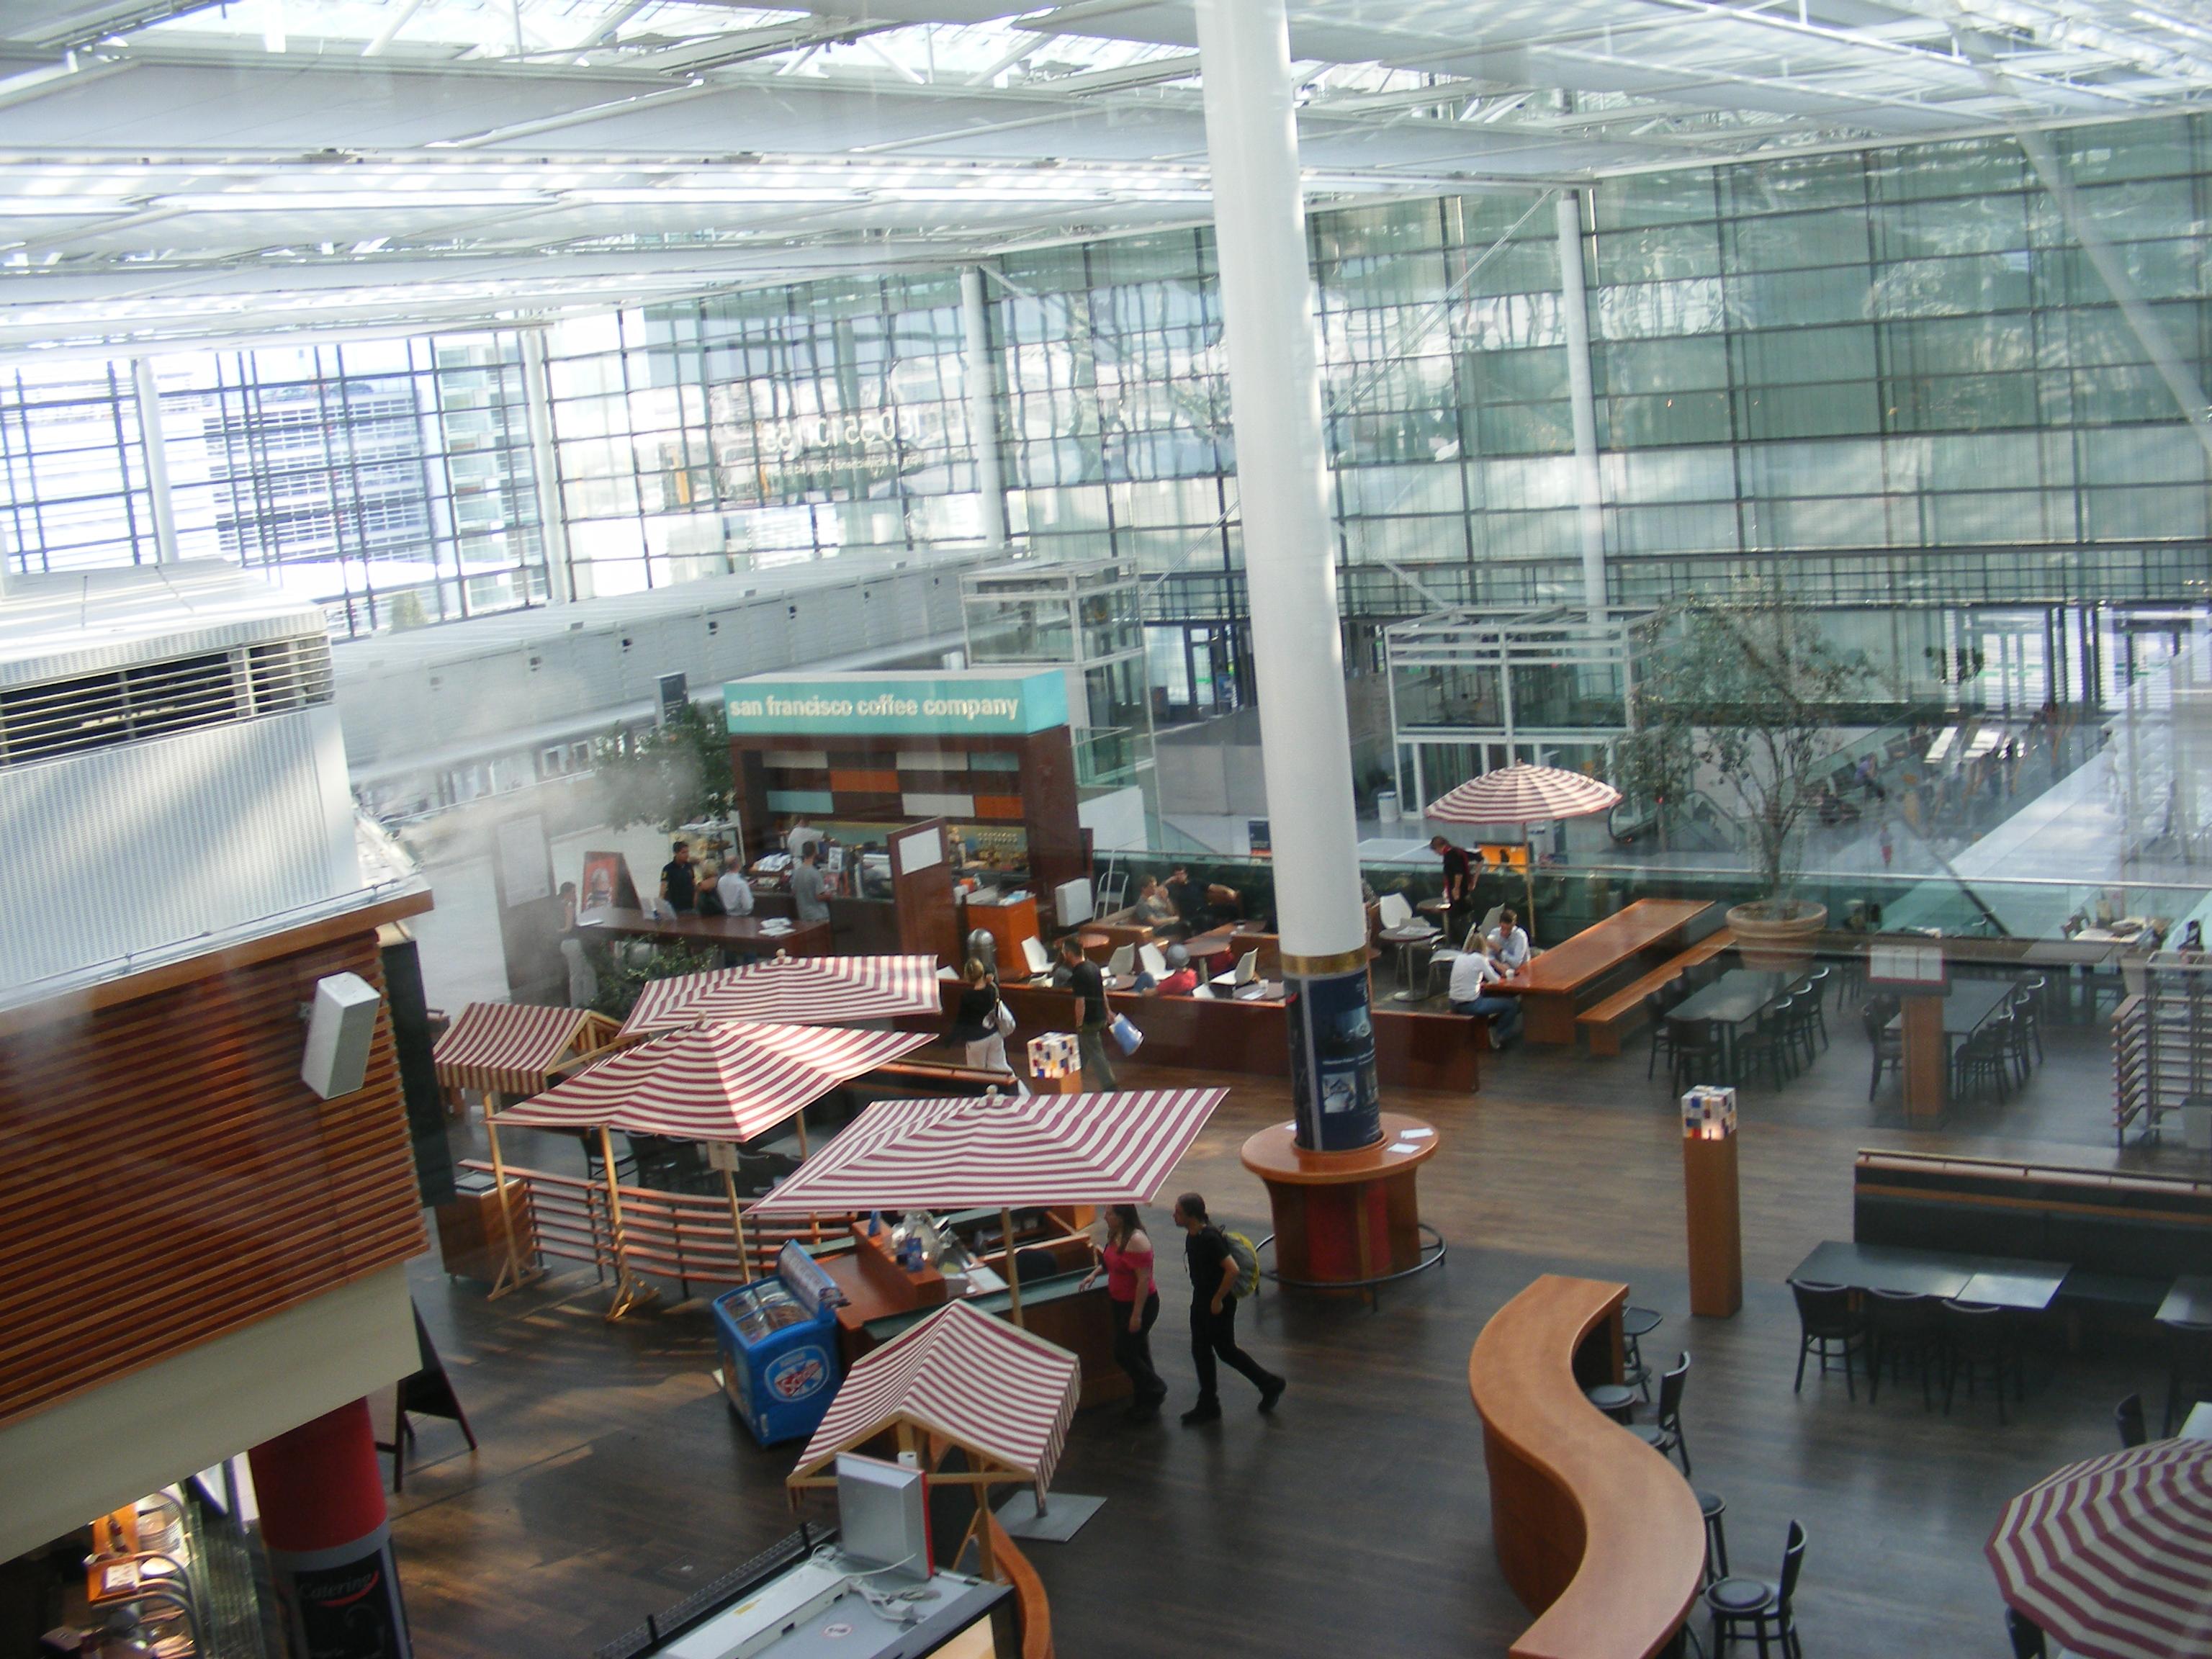 File:Munich Airport, Terminal 2 Level 05 - SFCC.jpg